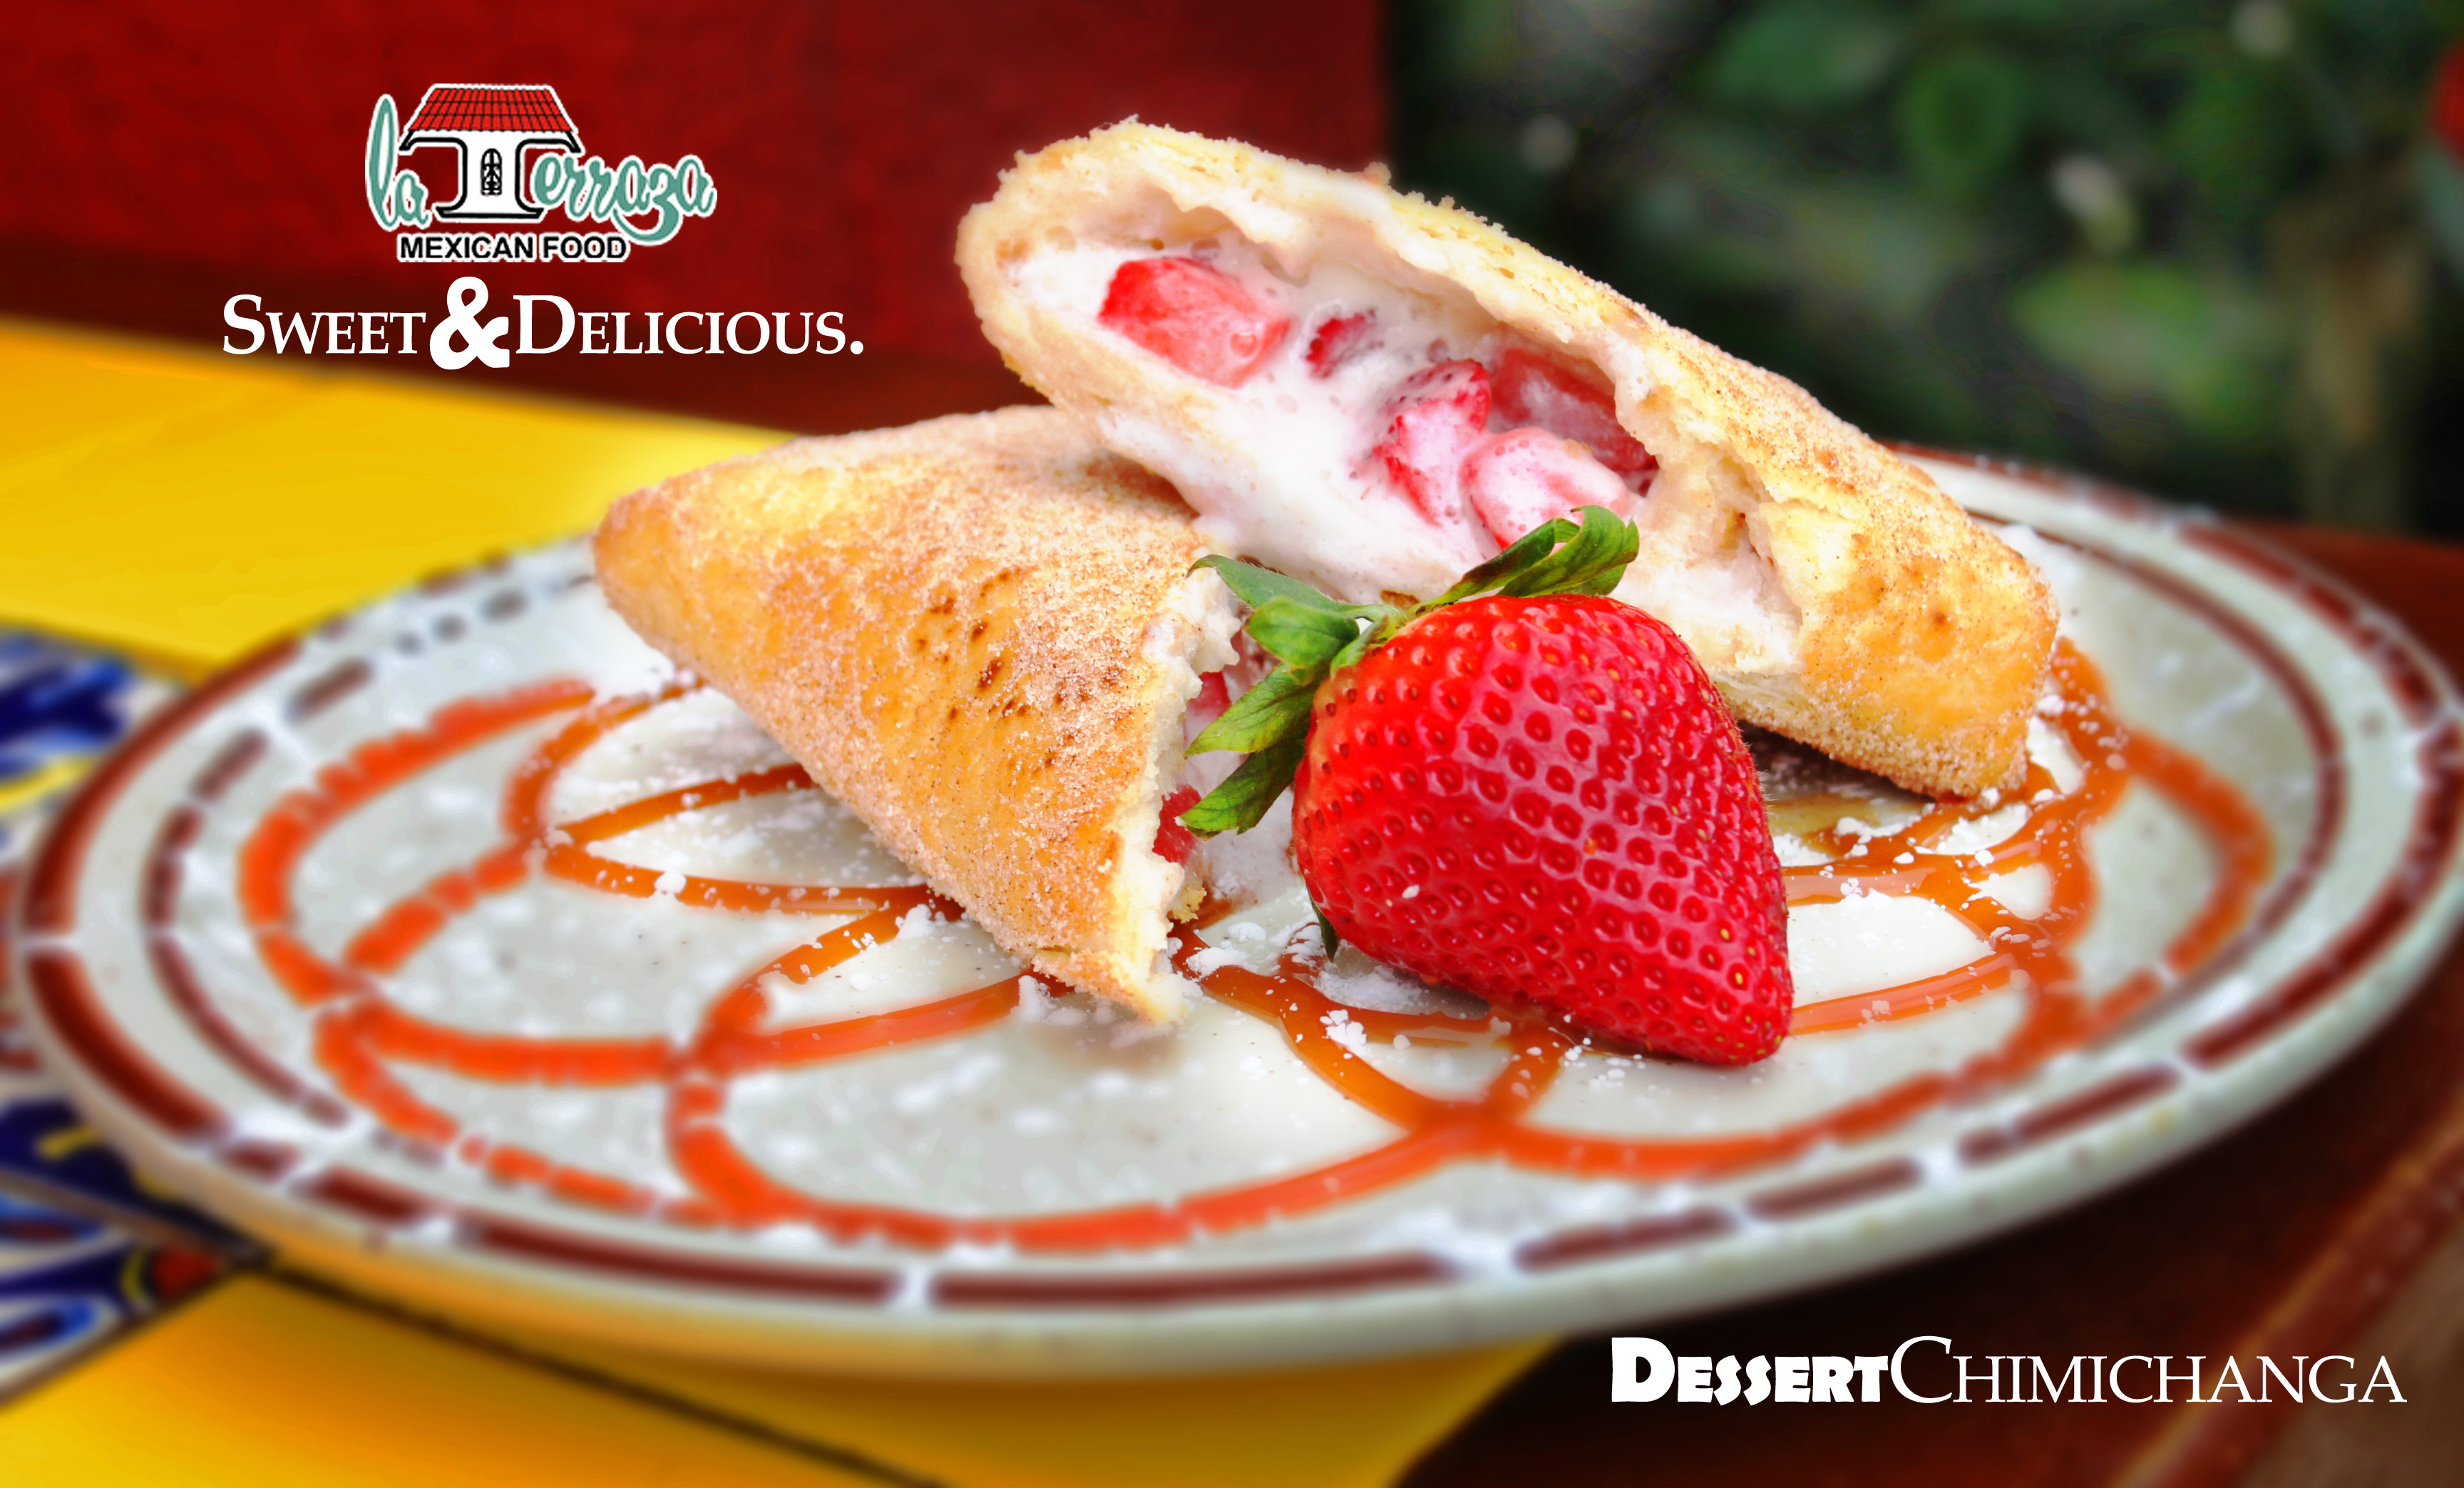 dessertchimichangatextlogo2